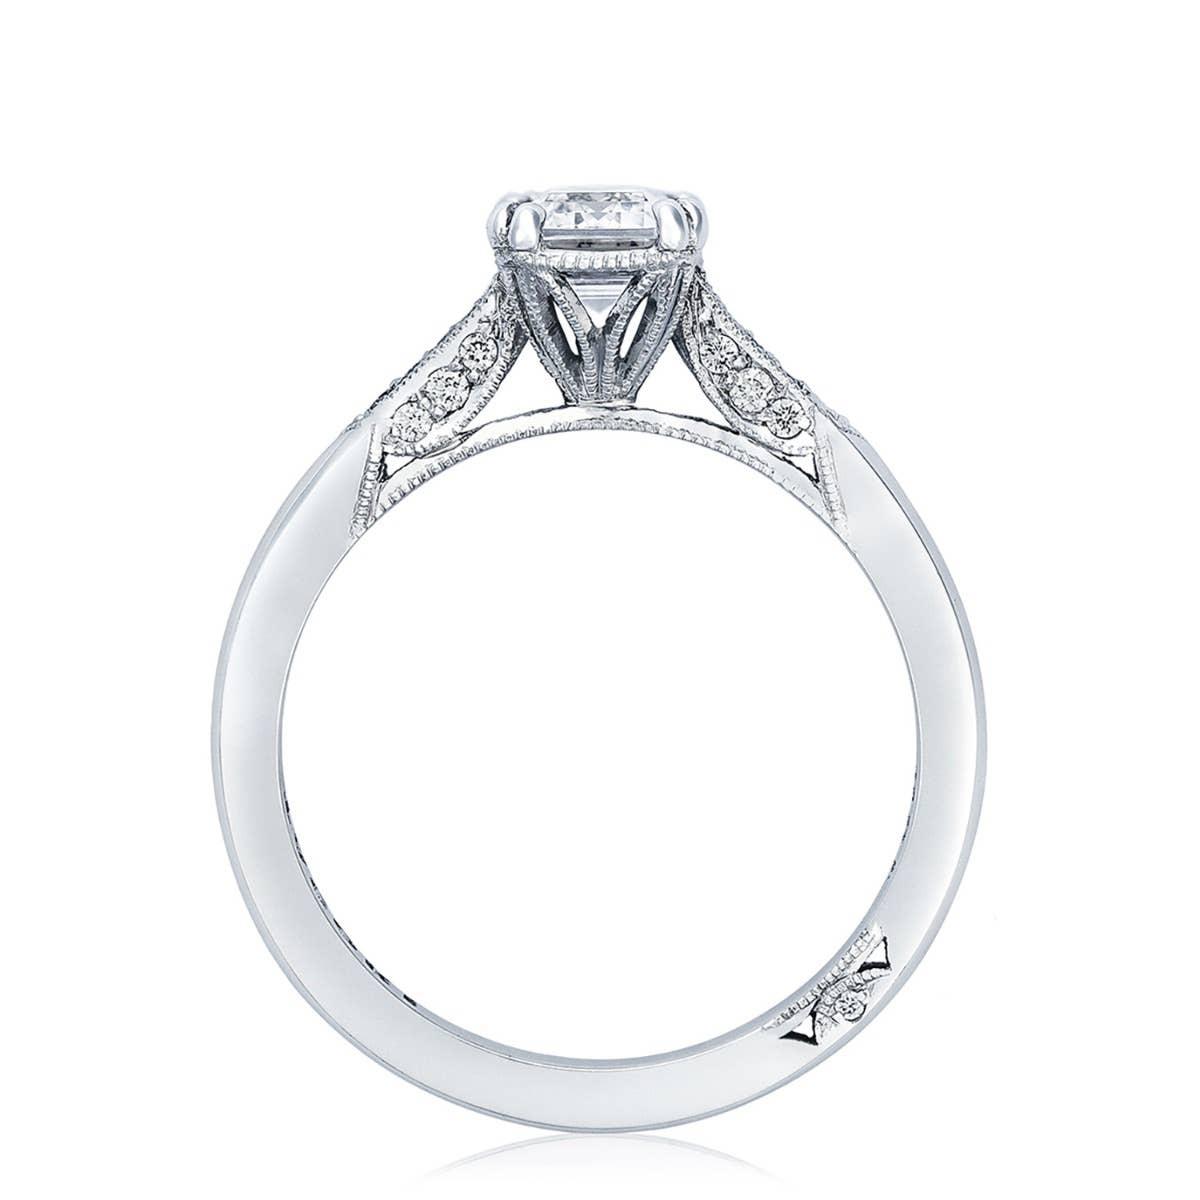 Tacori Engagement Rings - 2651ec